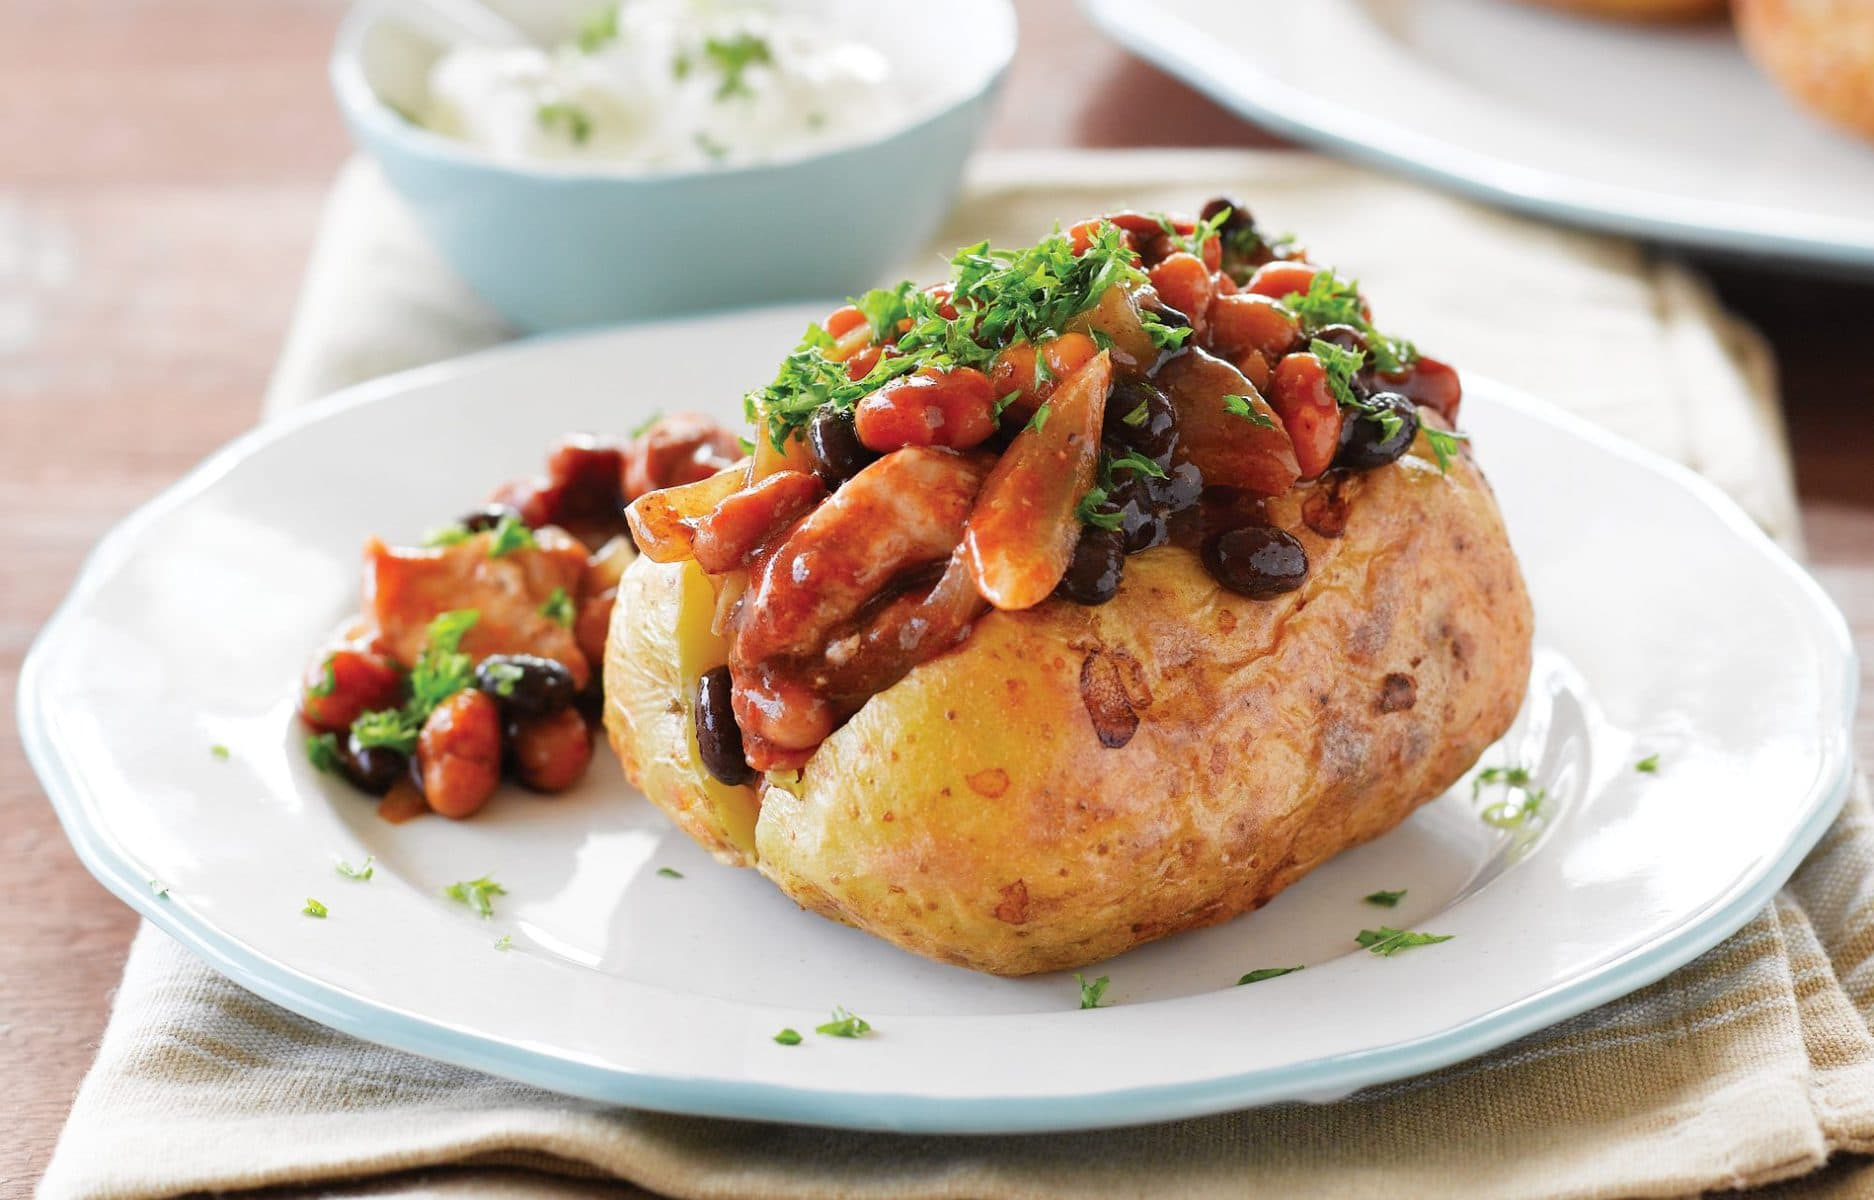 Pork and bean jacket potatoes